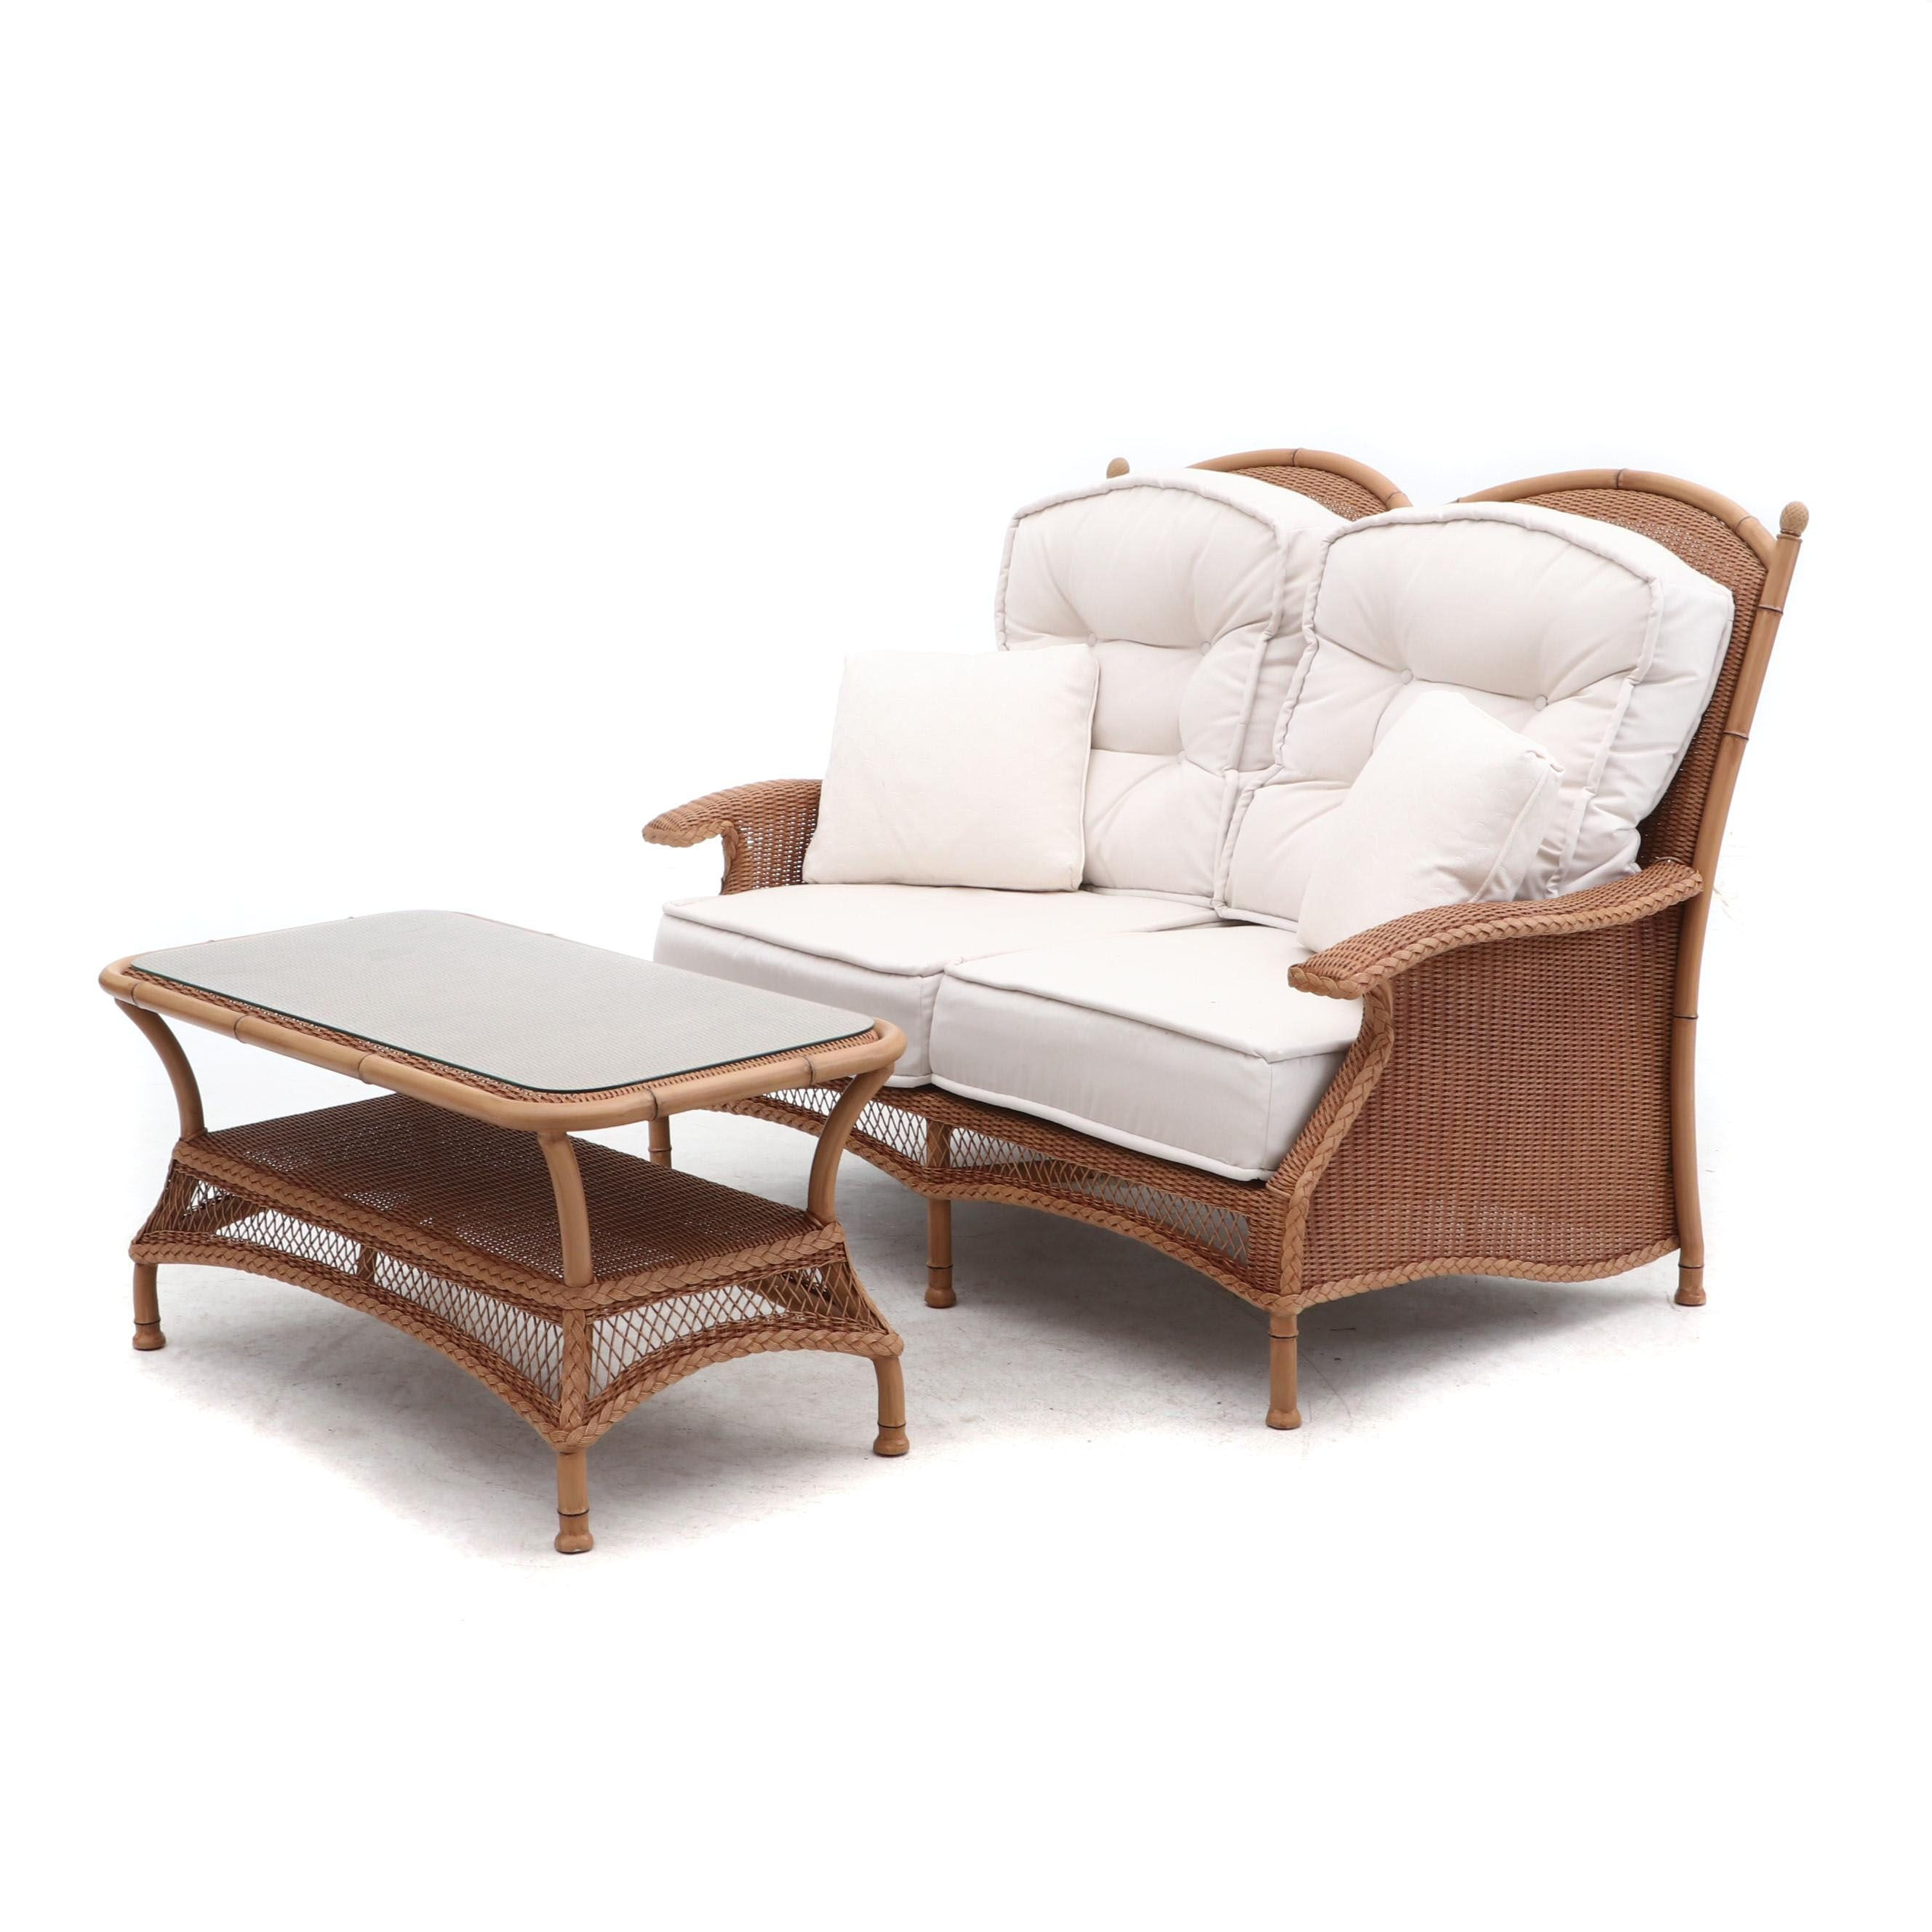 Lloyd Loom Woven Wicker Patio Love Seat and Coffee Table by Lloyd Flanders